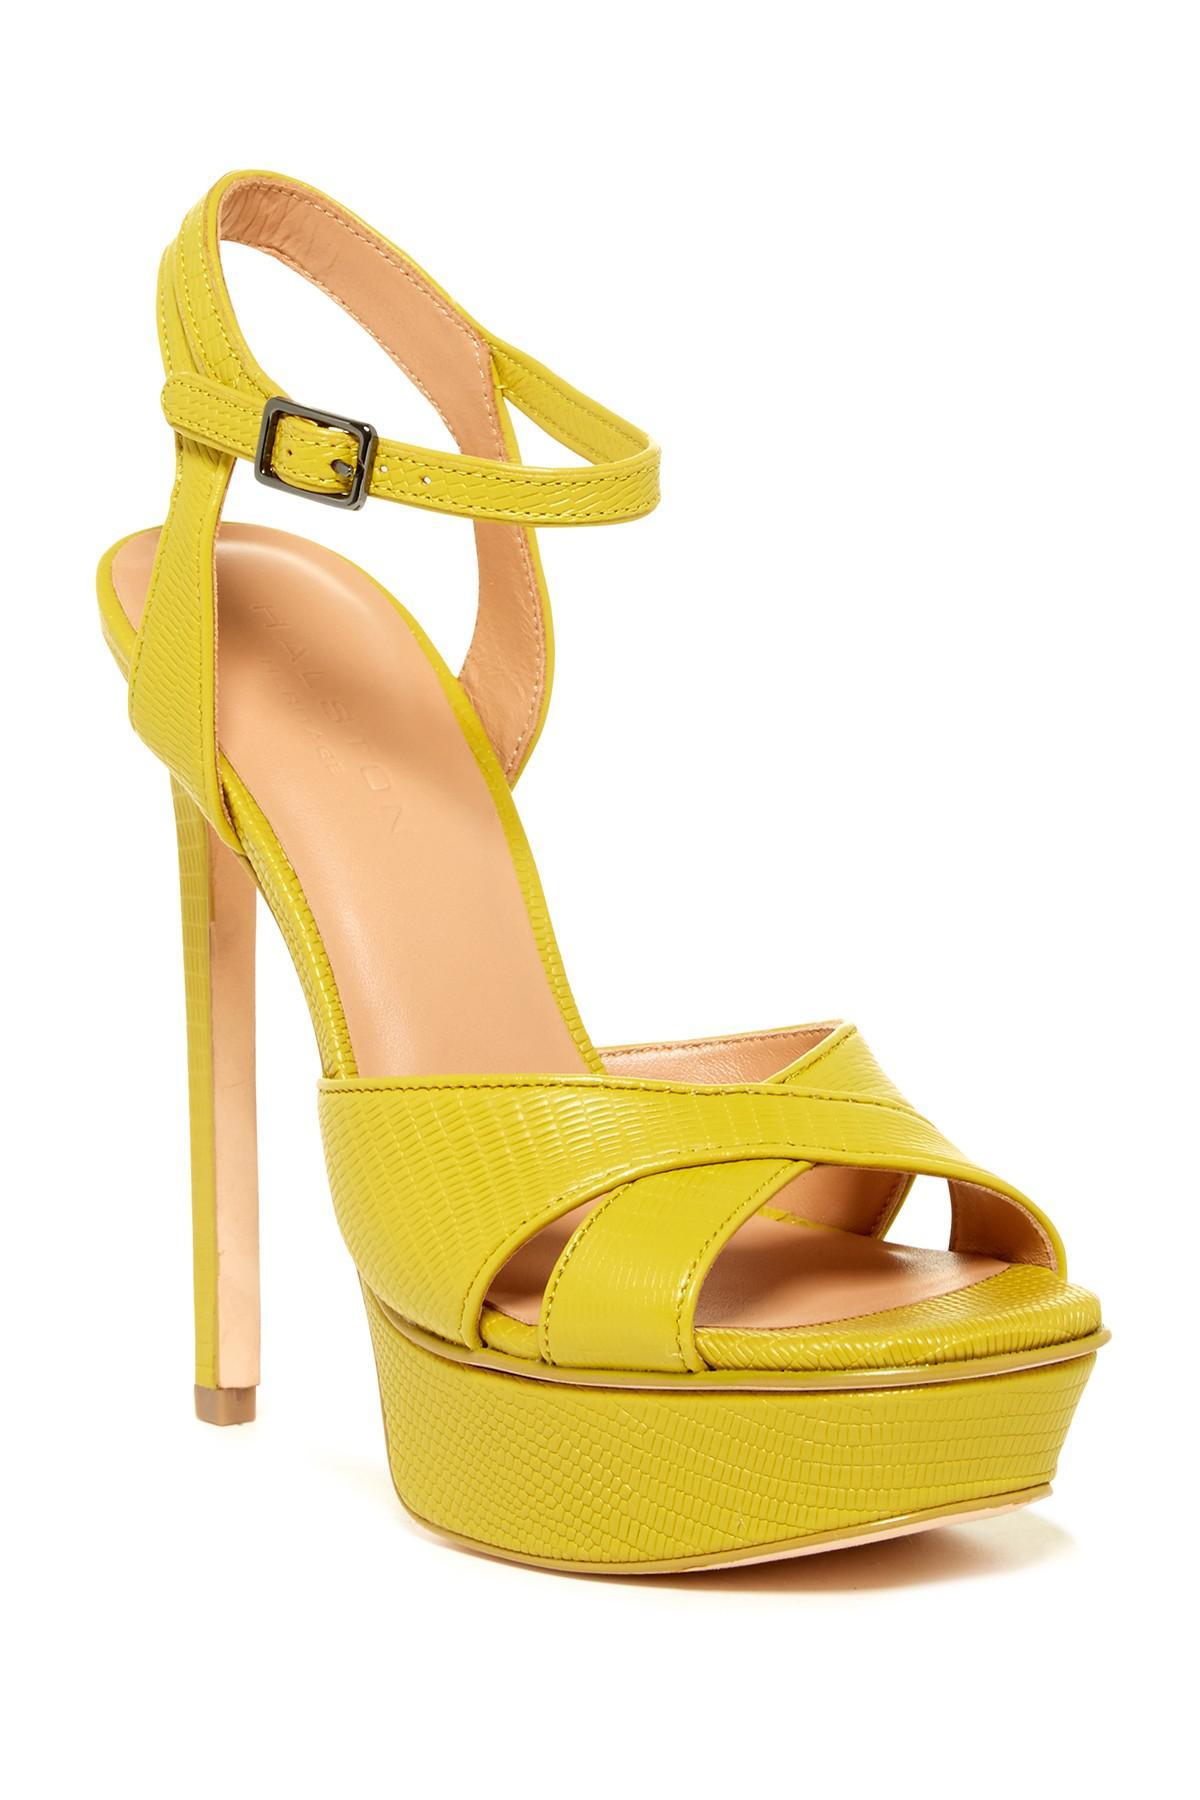 873b6e8a495b Lyst - Halston Naomi Reptile Embossed Platform Sandal in Yellow